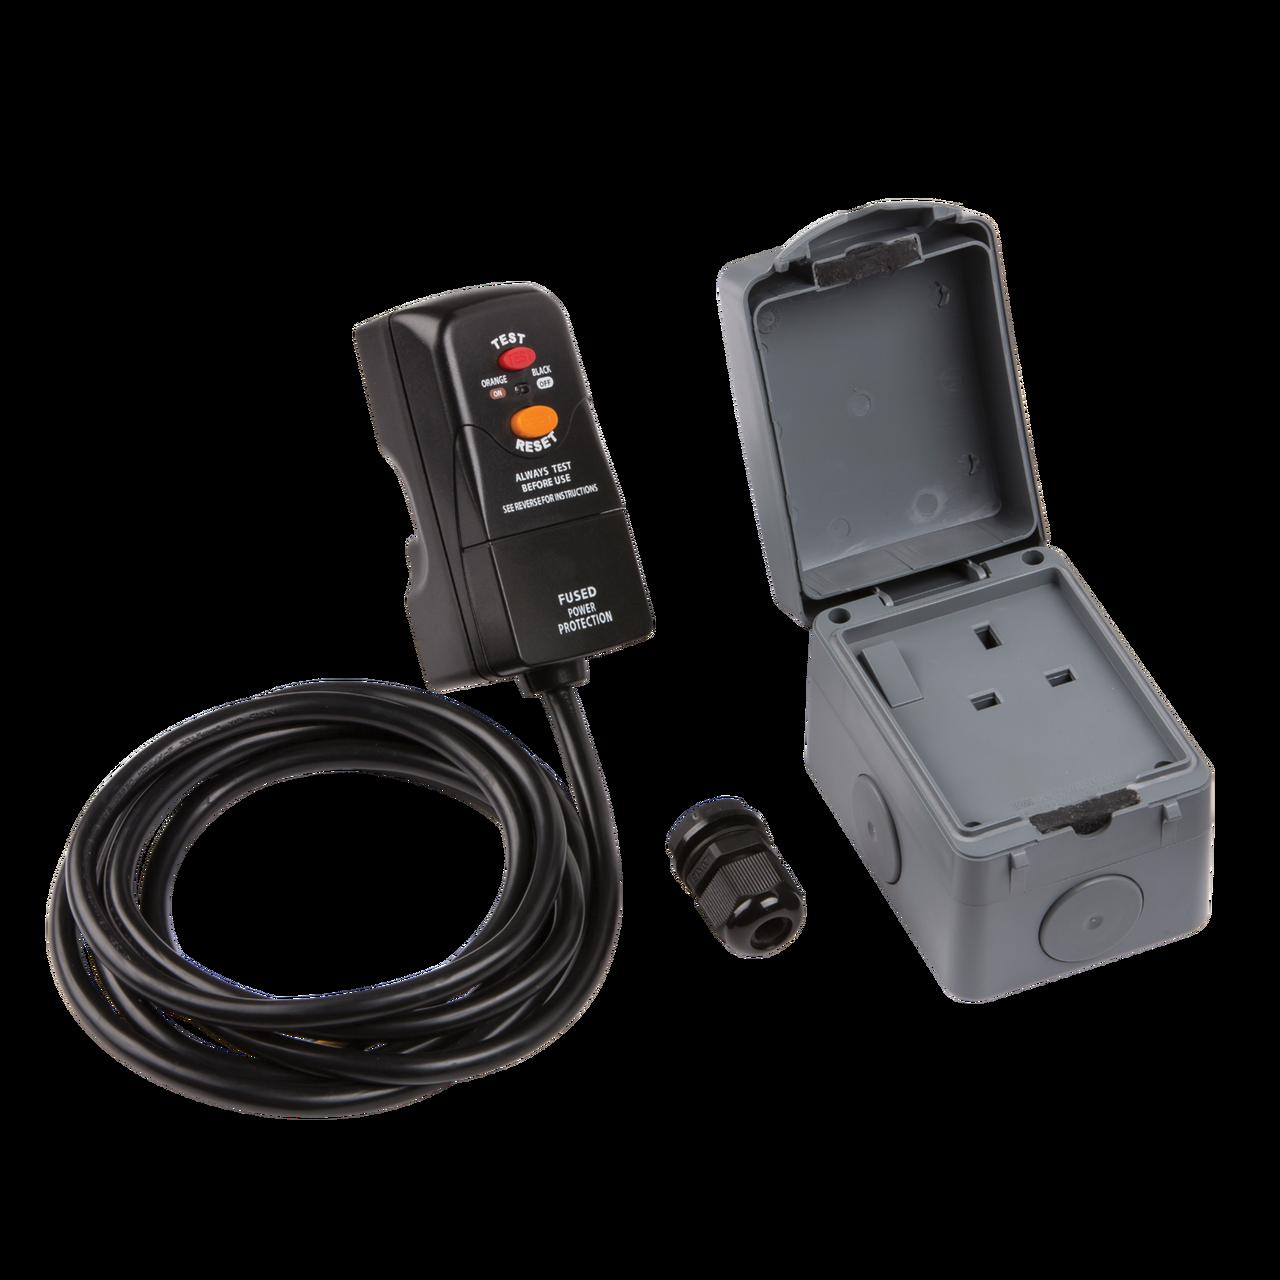 IP66 (Outdoor) 13a Outdoor Socket Kit - Marshall Industrial Supplies